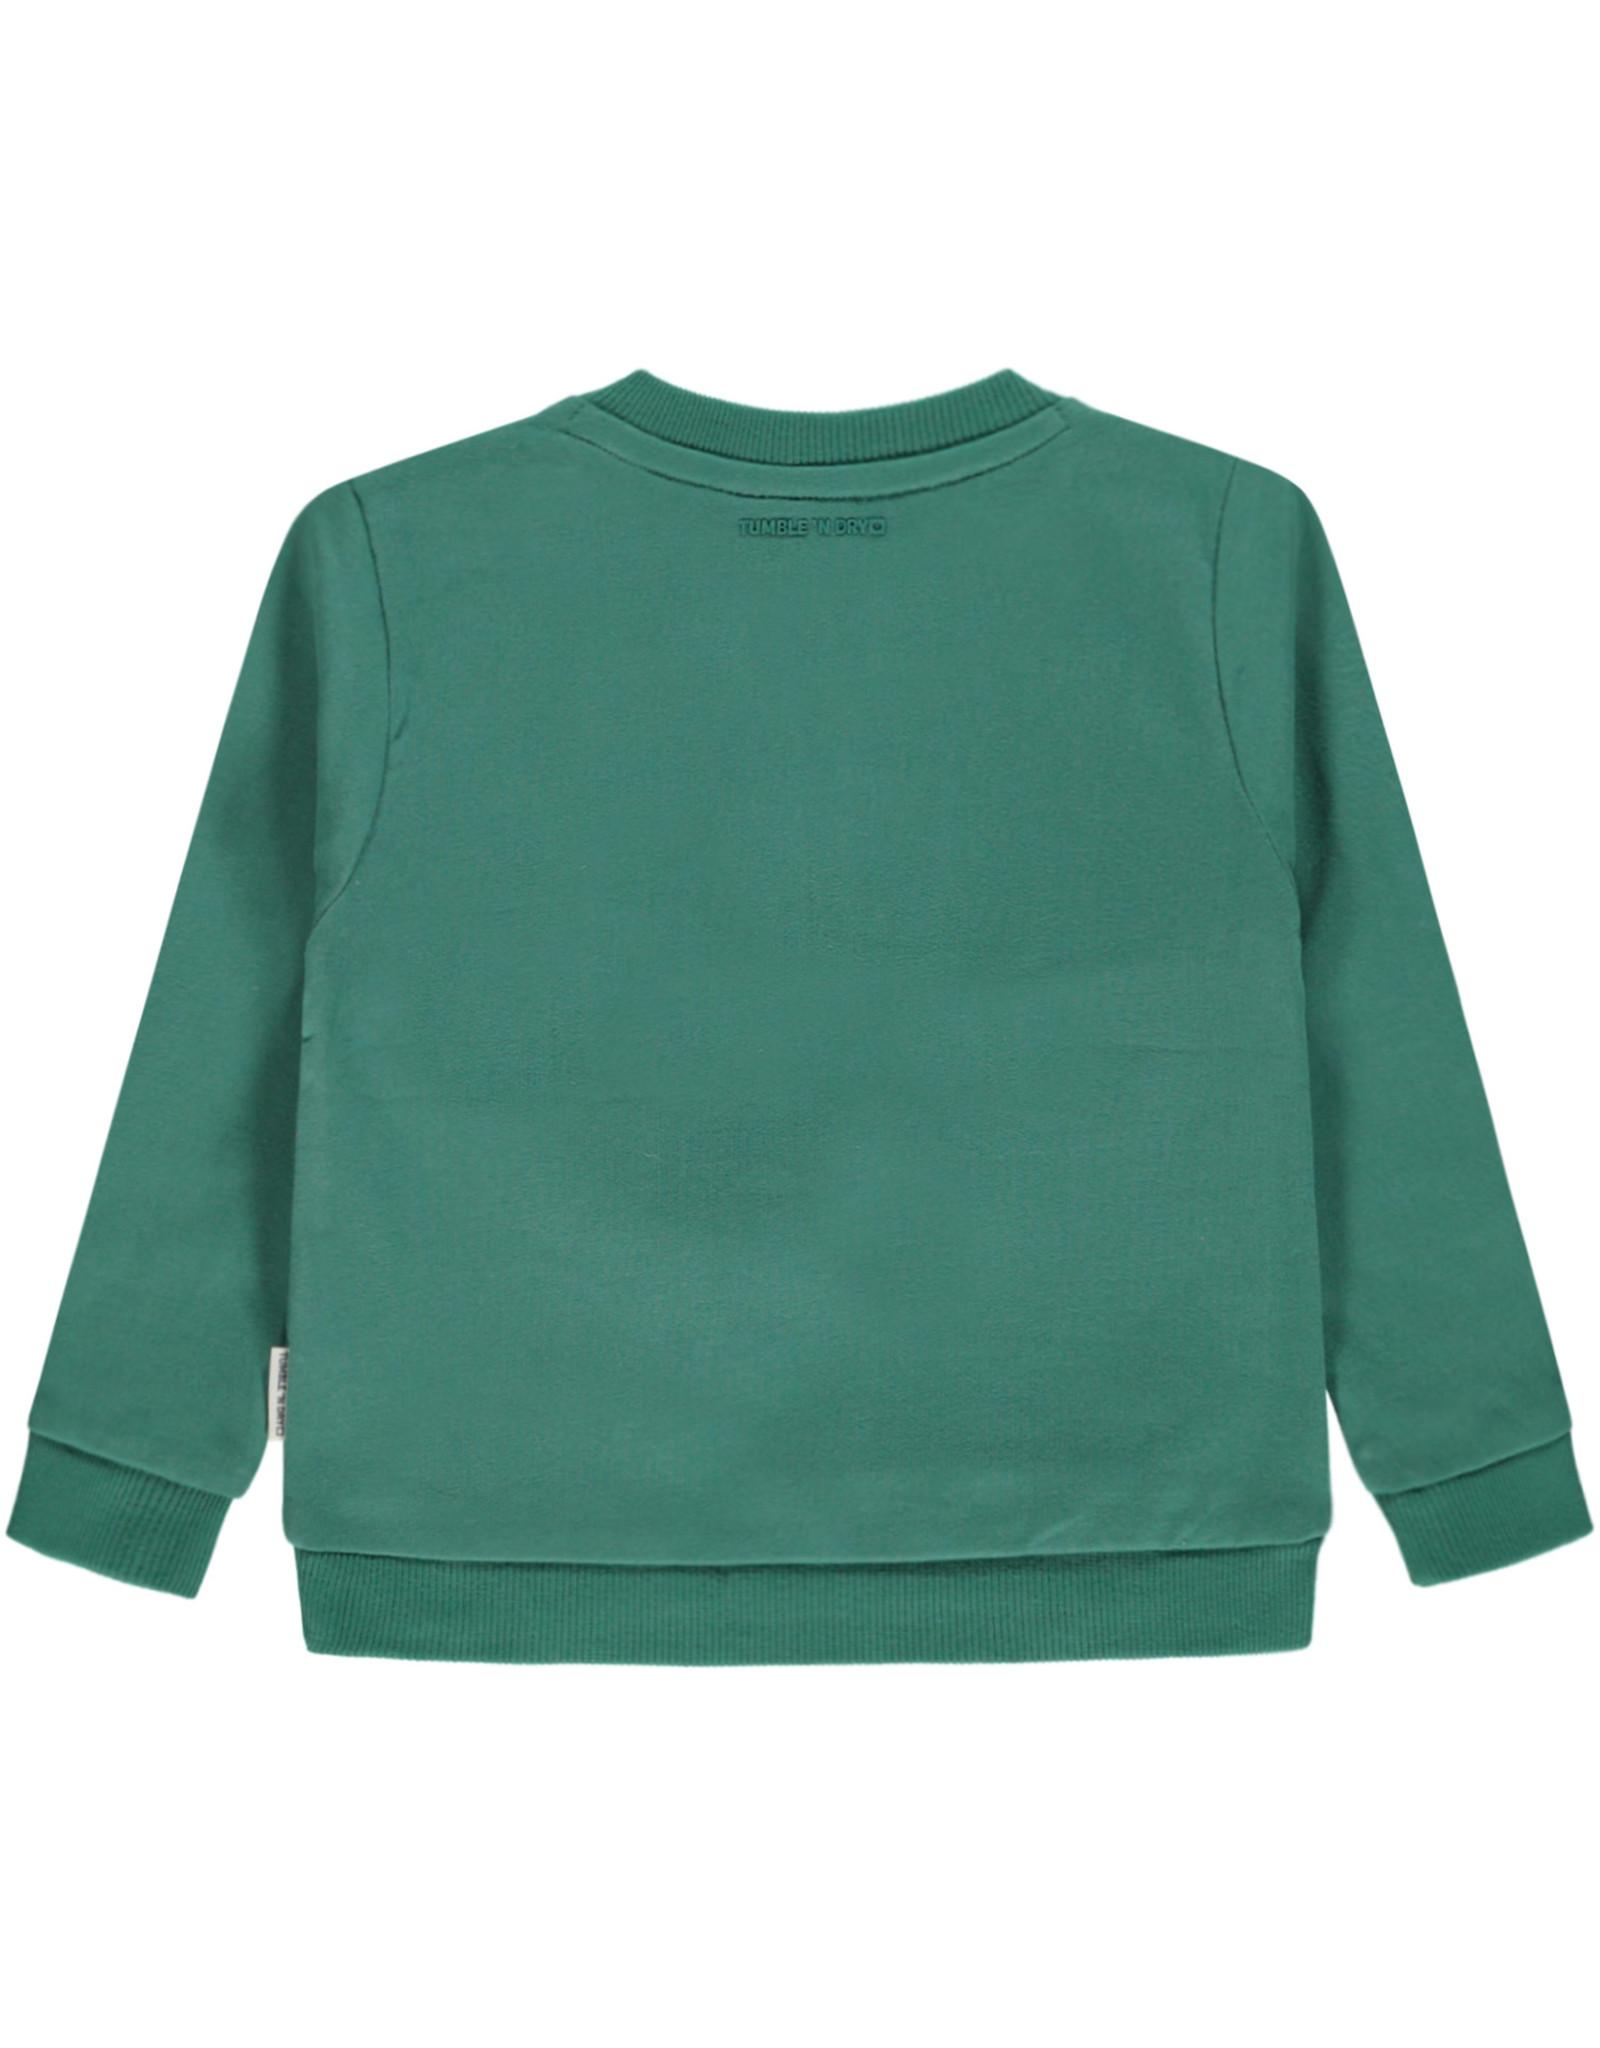 Tumble 'n Dry Jaike Sweater Green dark